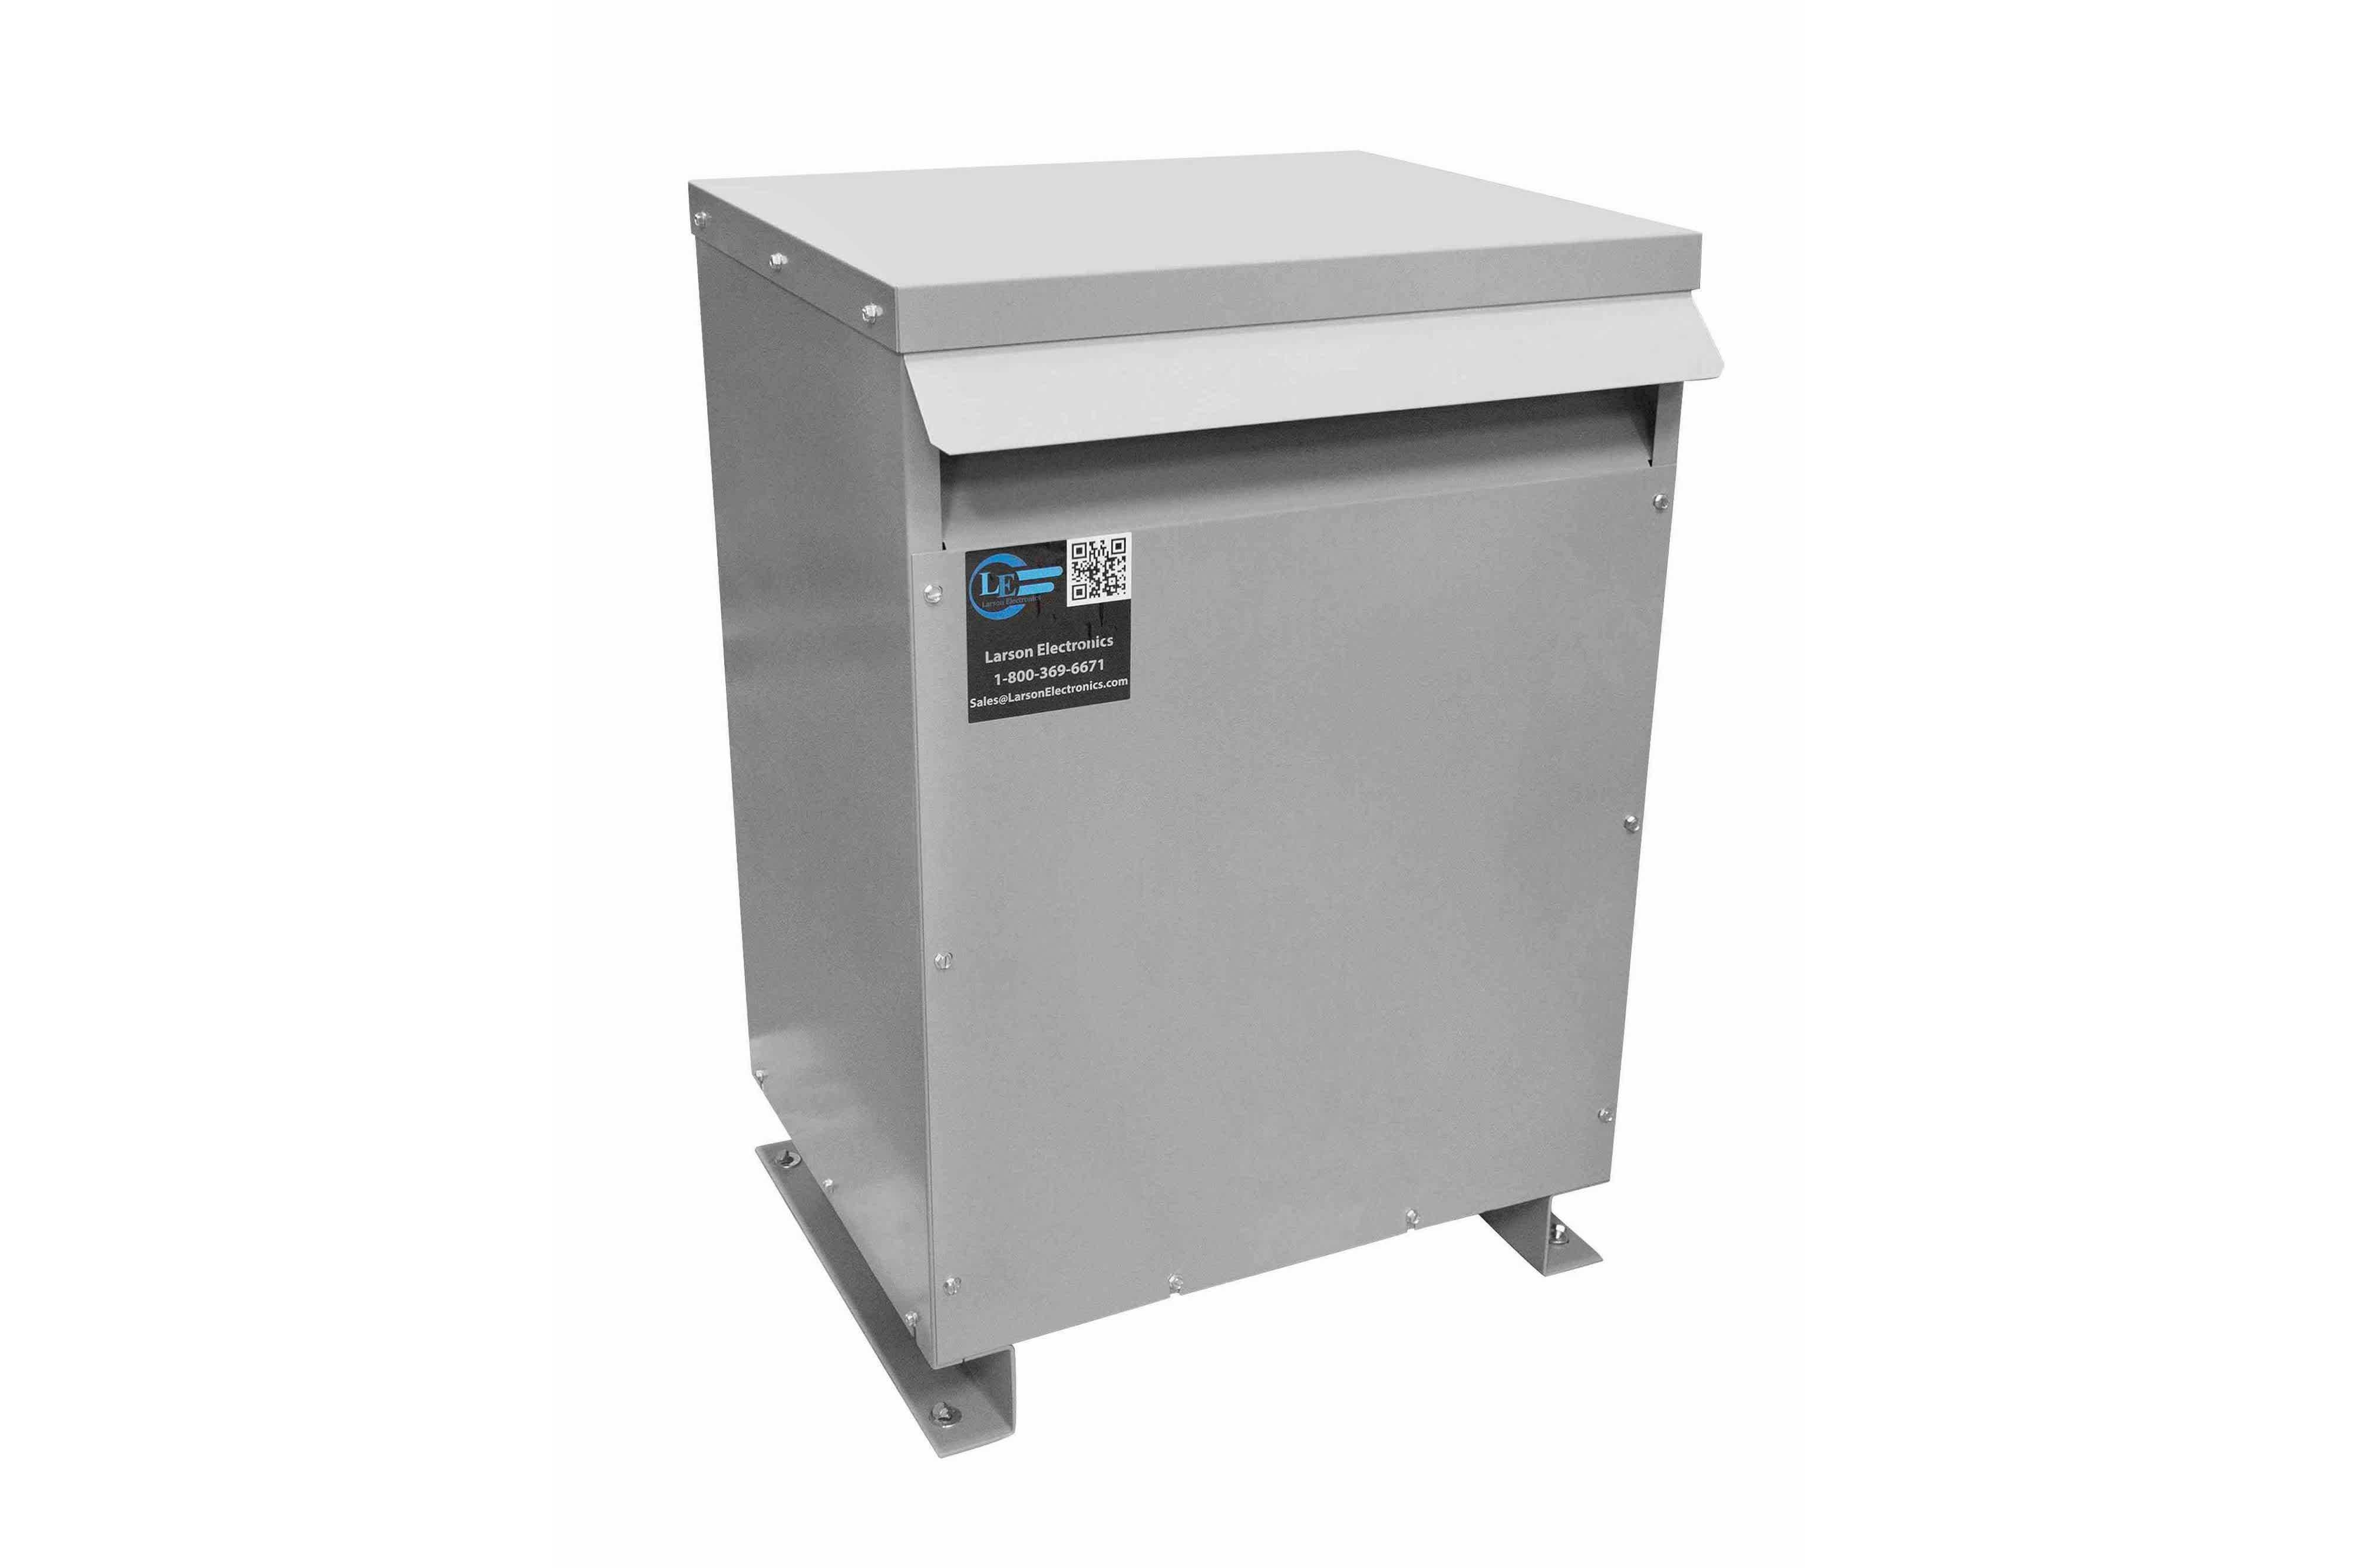 52.5 kVA 3PH Isolation Transformer, 460V Wye Primary, 208Y/120 Wye-N Secondary, N3R, Ventilated, 60 Hz